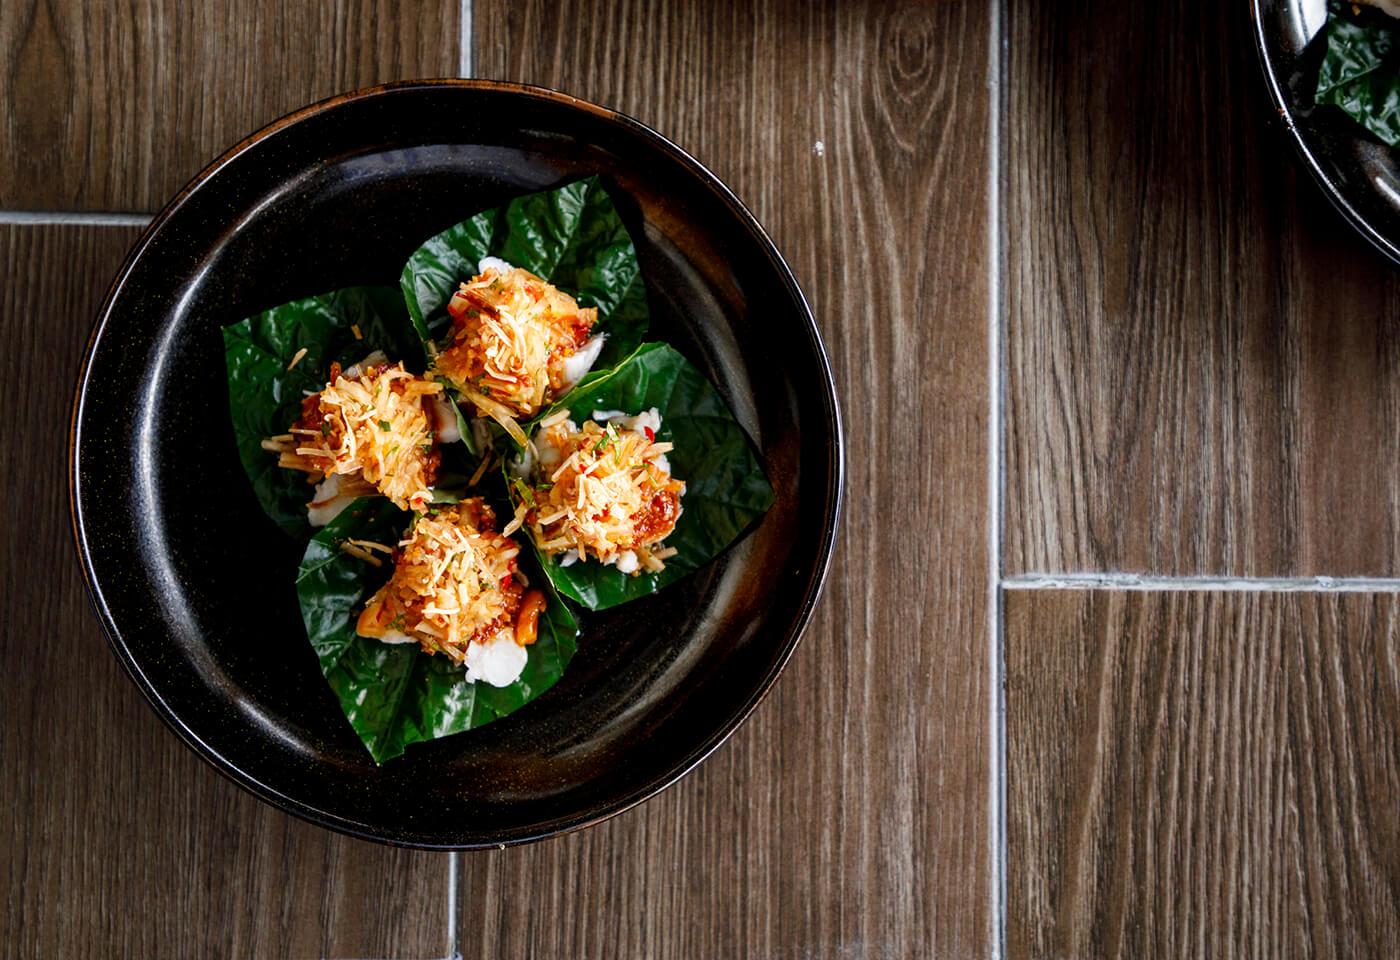 veggie wrap in a bowl